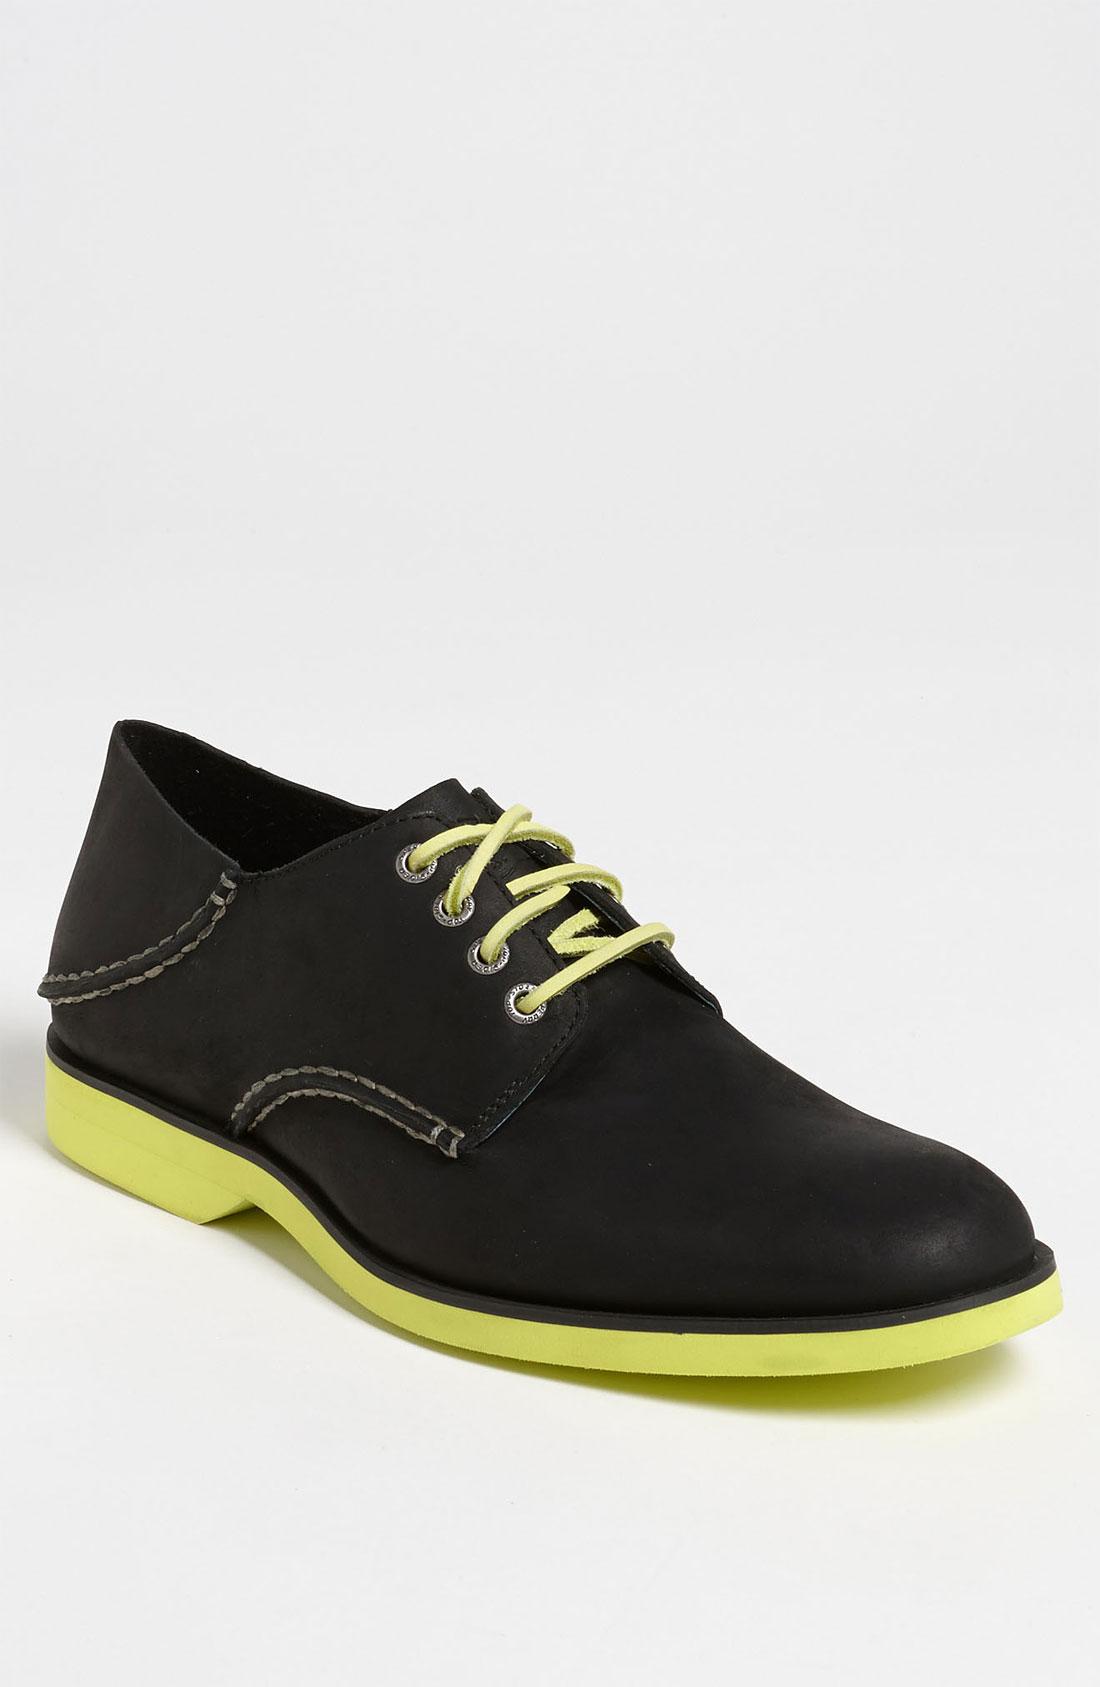 sperry top sider boat ox buck shoe in black for black